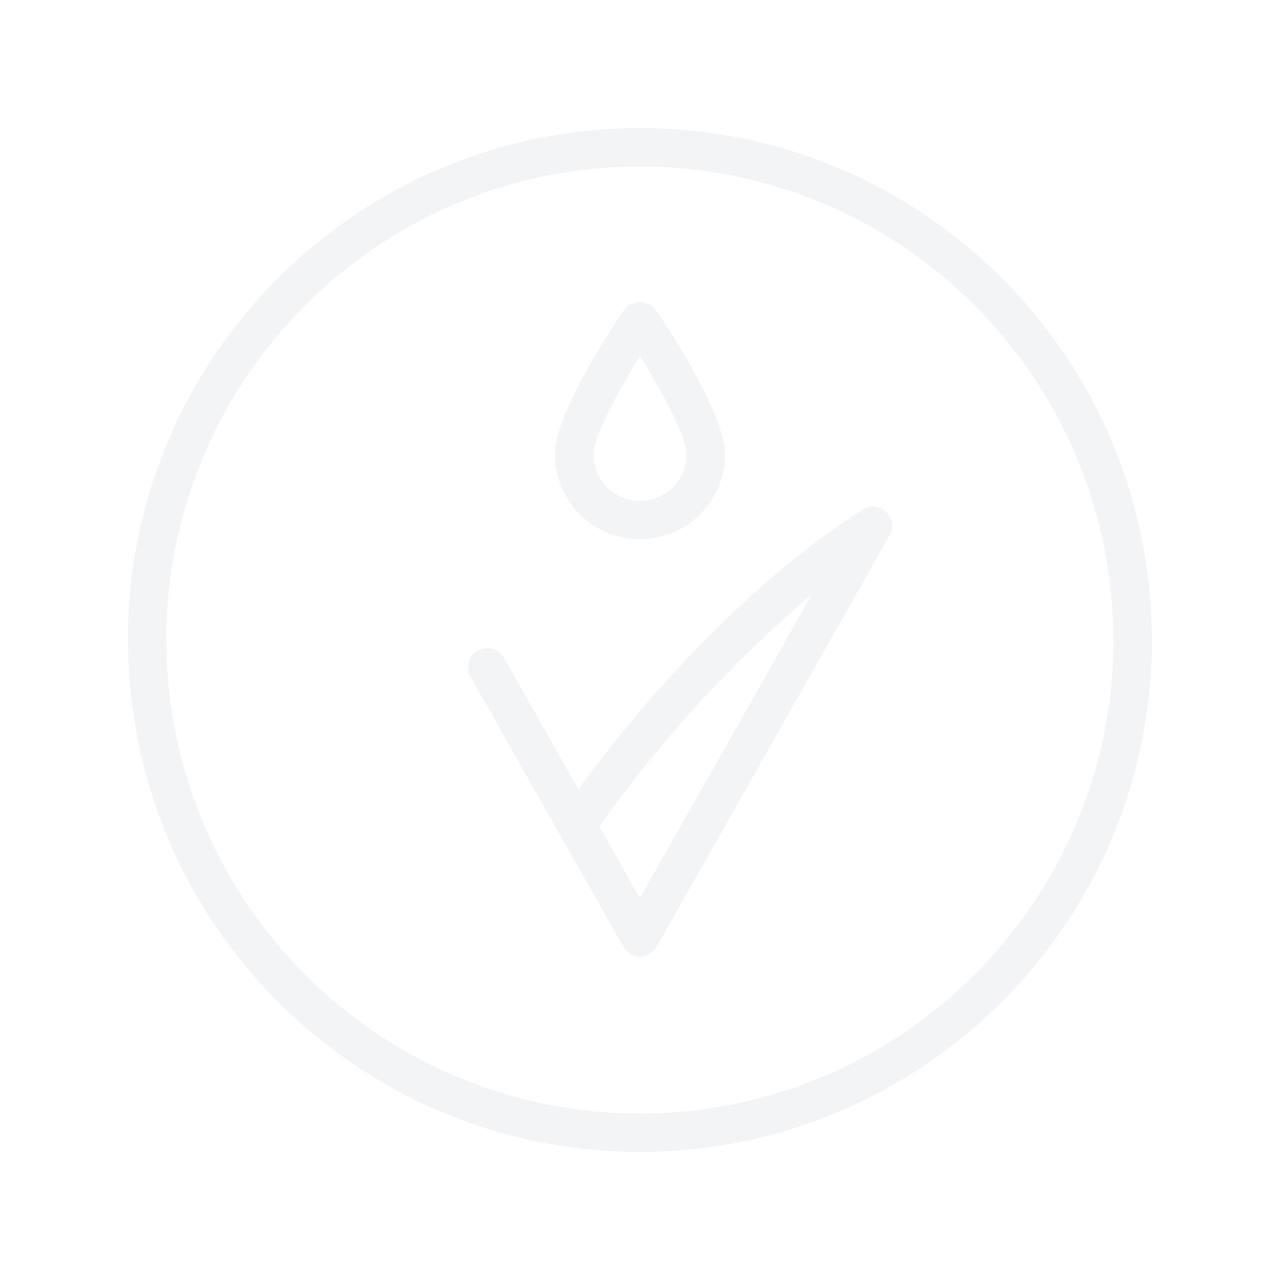 Collistar Perfecta Plus Eye Contour Perfection Cream 15ml